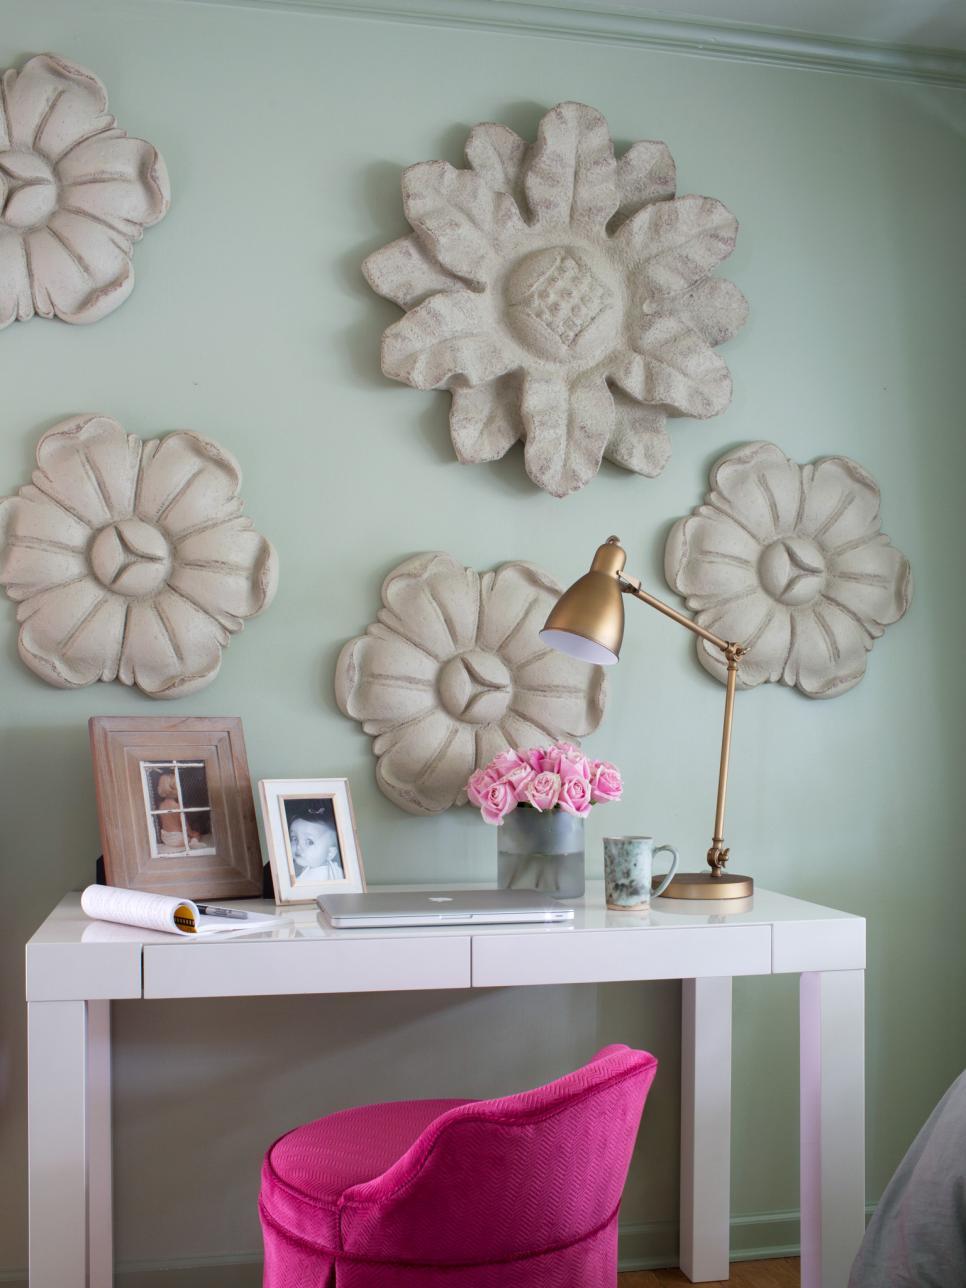 Cottage-Style Bedroom Decorating Ideas | HGTV